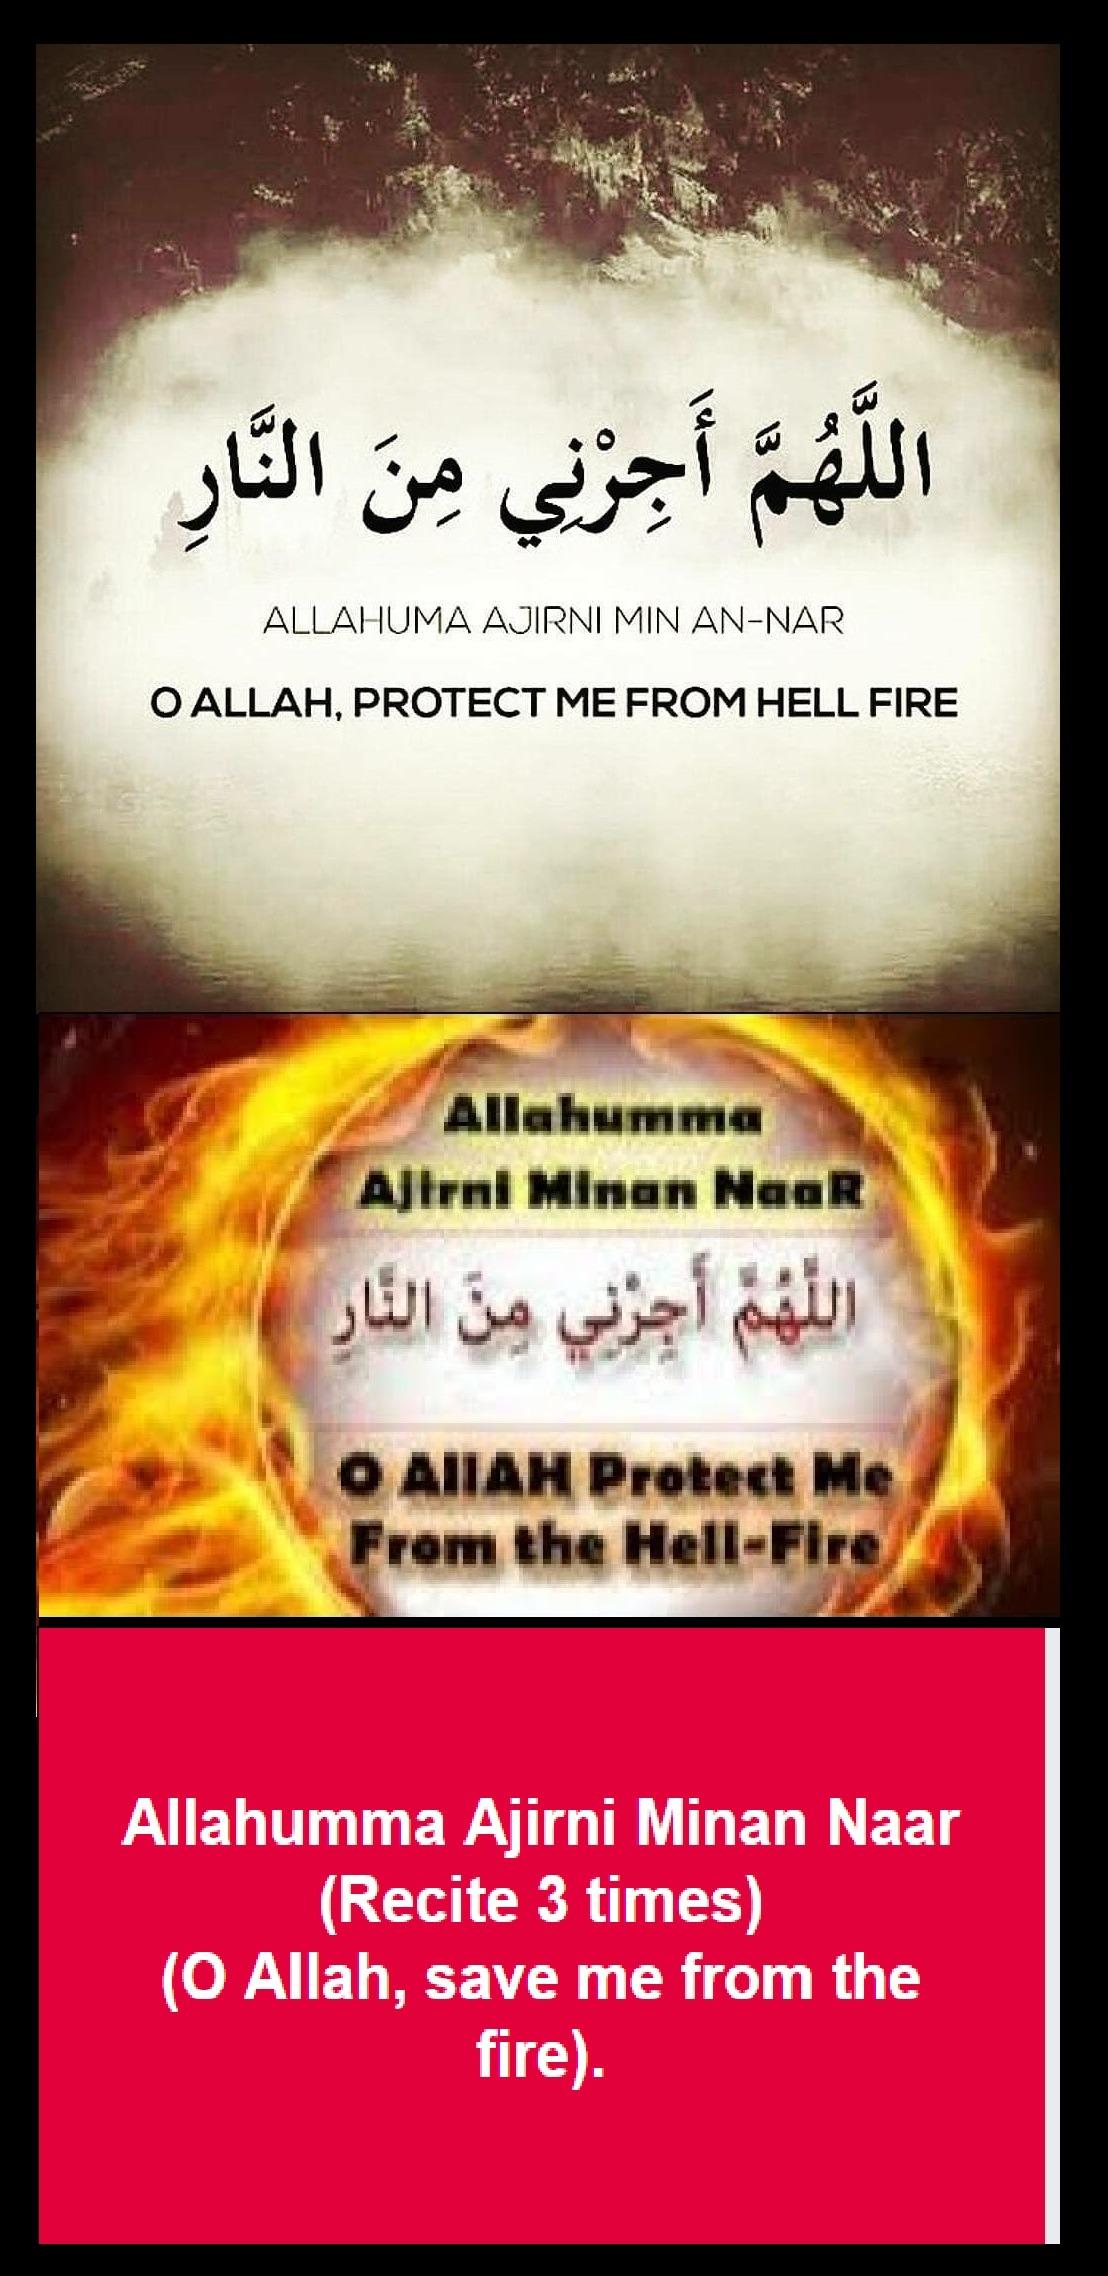 Allahumma Ajirni Minannar : allahumma, ajirni, minannar, PROTECTION, Explore, Tumblr, Posts, Blogs, Tumgir